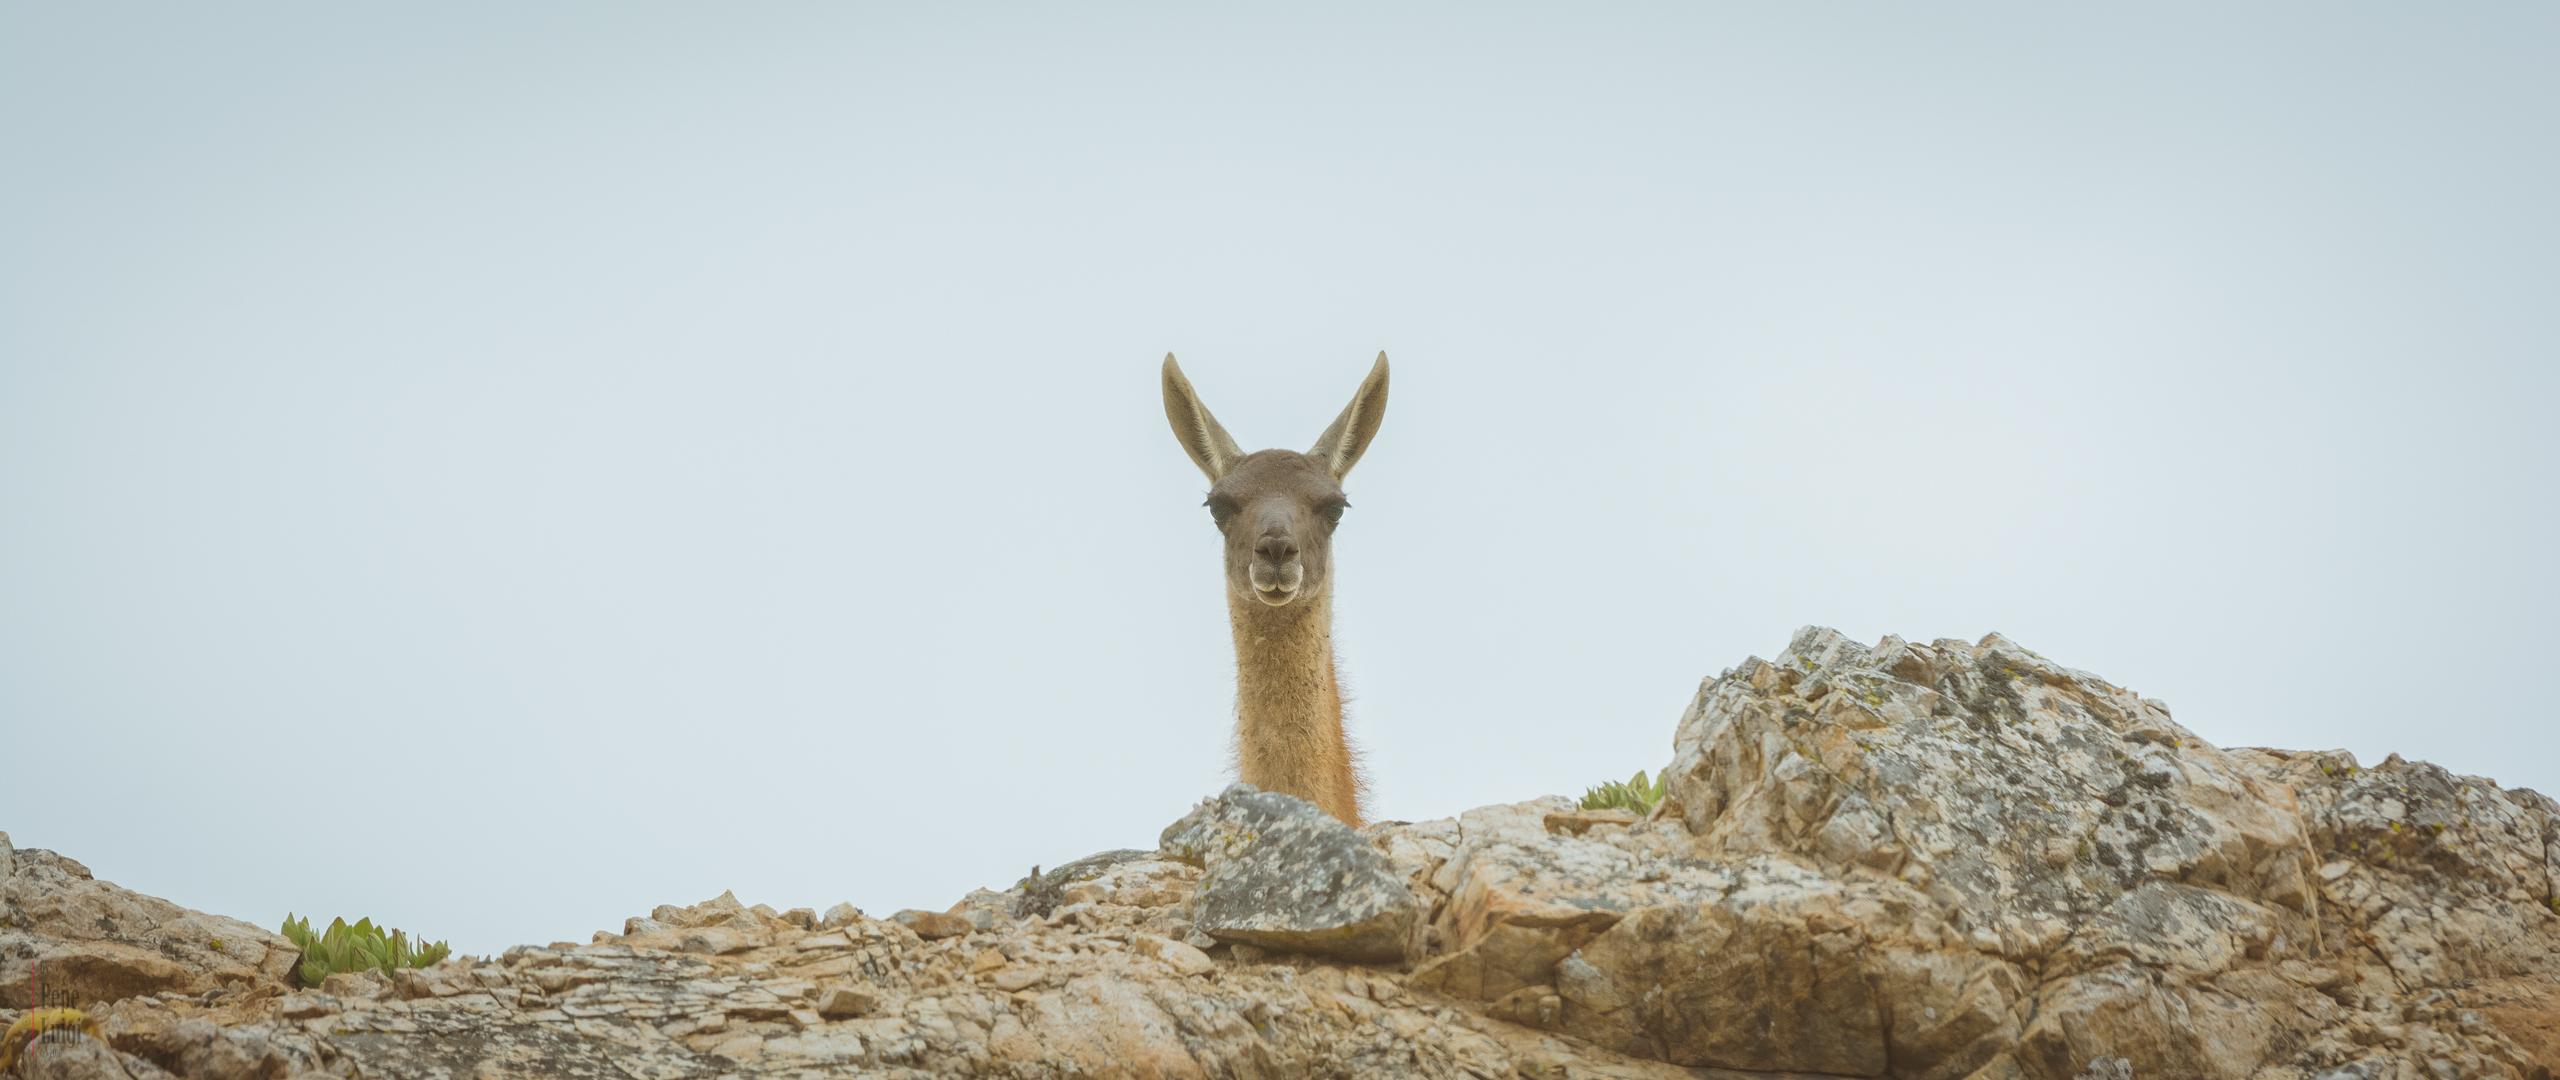 Spy | Parque Nacional Pan de Azúcar